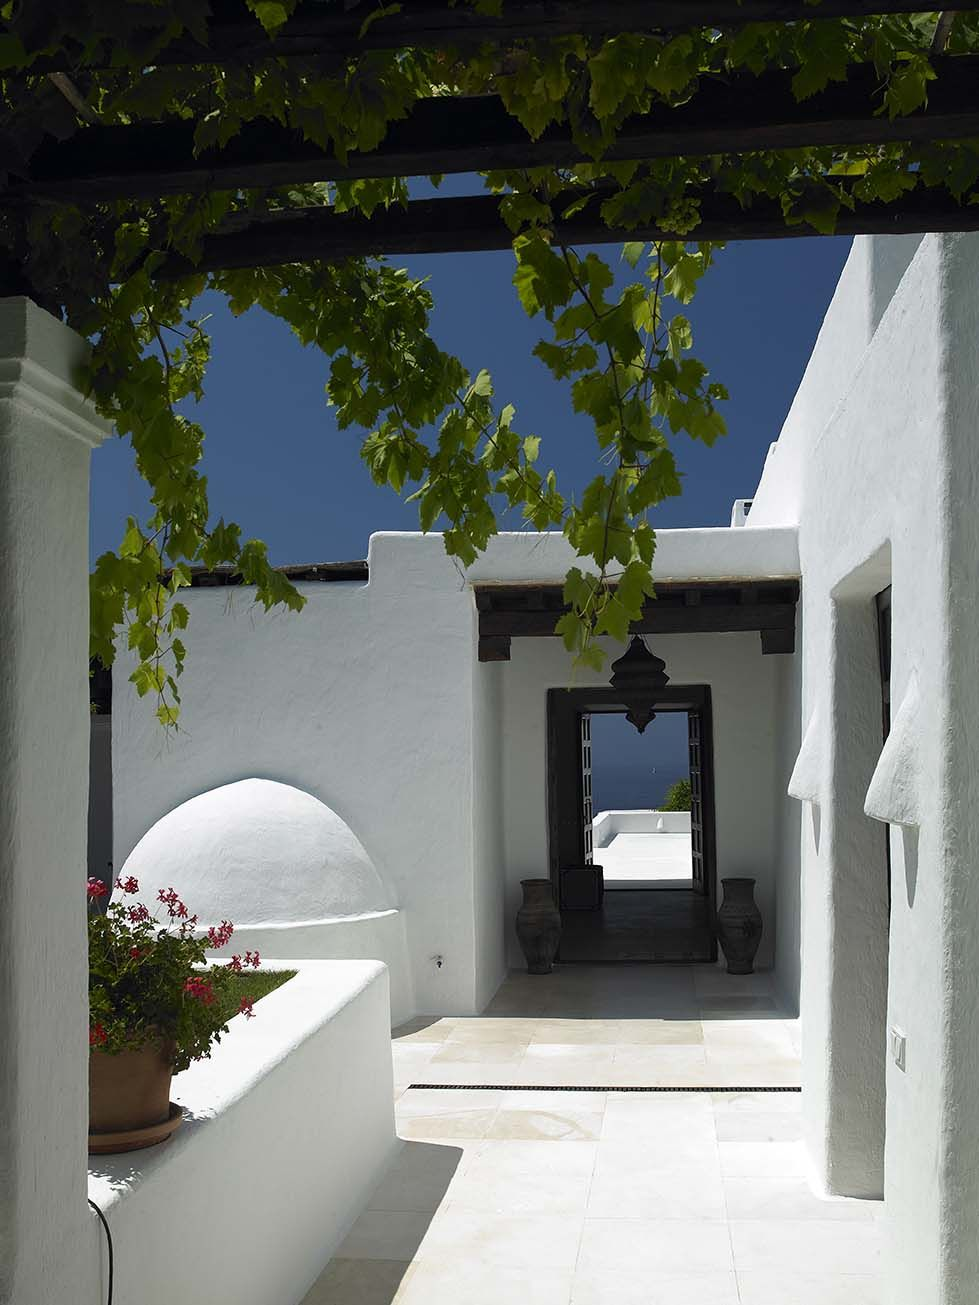 Blakstad design consultants projects ibiza casita pinterest maison am nagement and for Exterior home design consultant